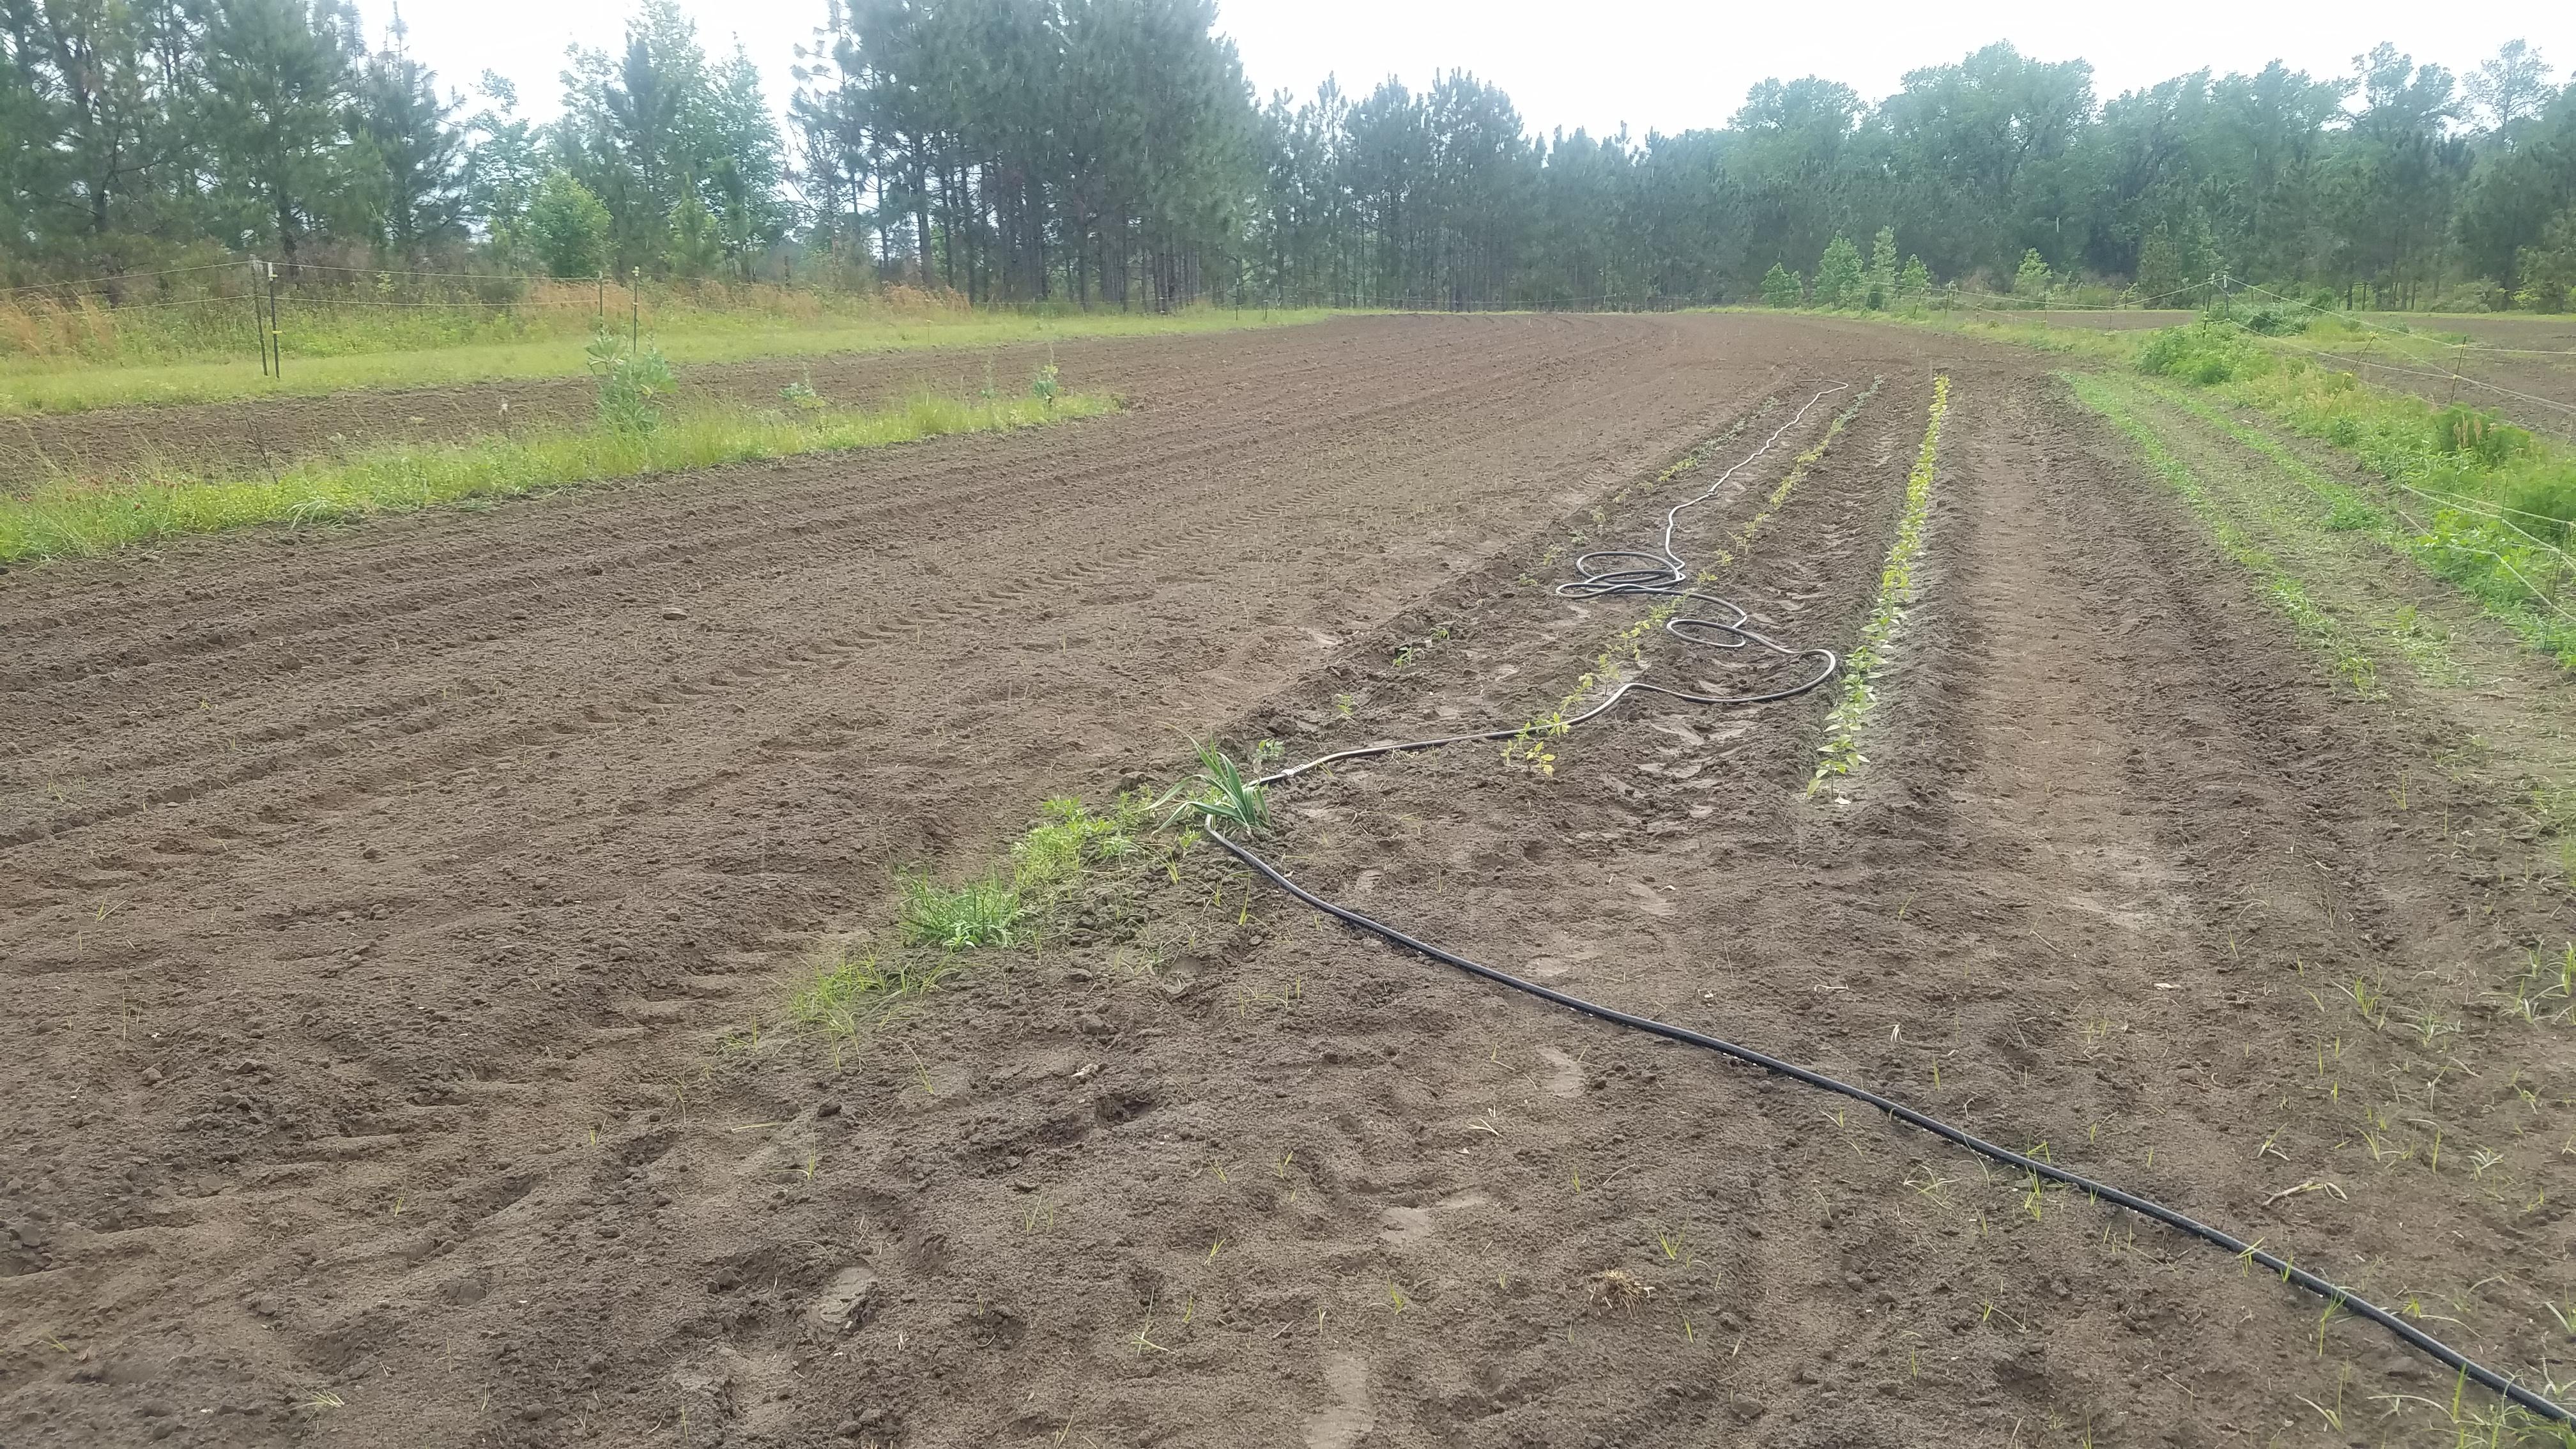 4032x2268 Water hose no longer necessary., After rain, in Planting Garden, by John S. Quarterman, for OkraParadise.com, 8 April 2019